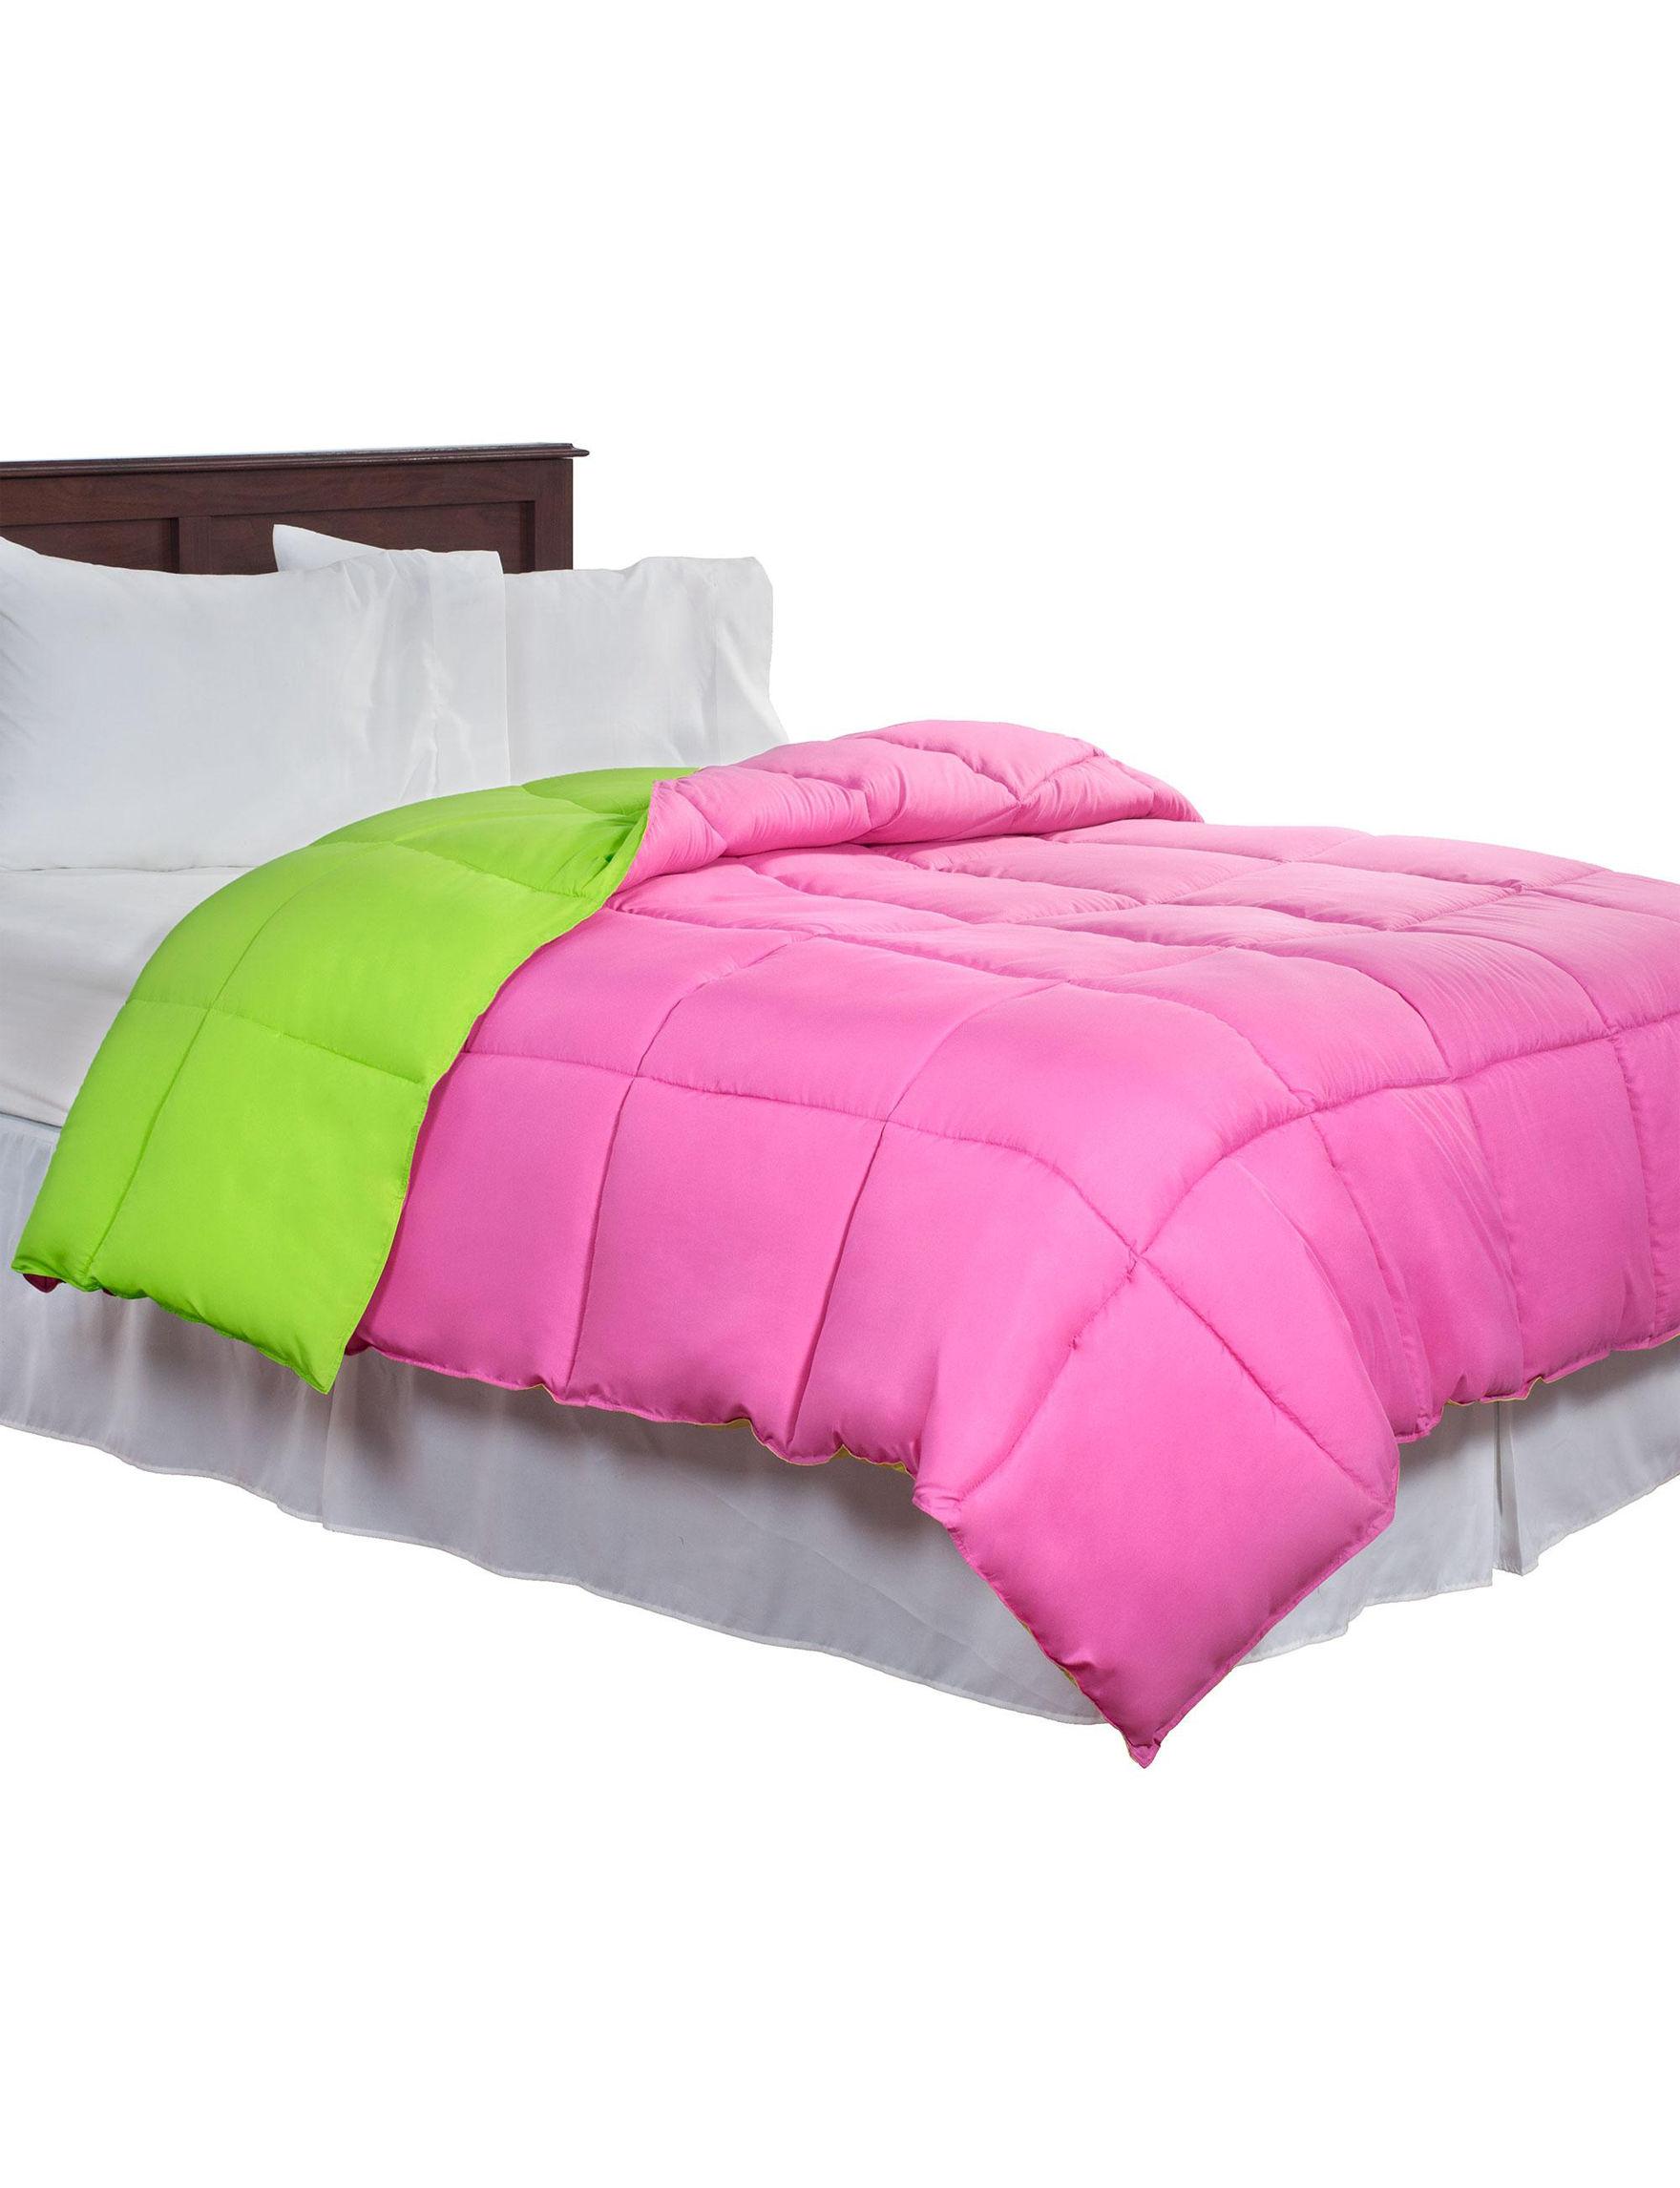 Lavish Home Pink / Green Down & Down Alternative Comforters